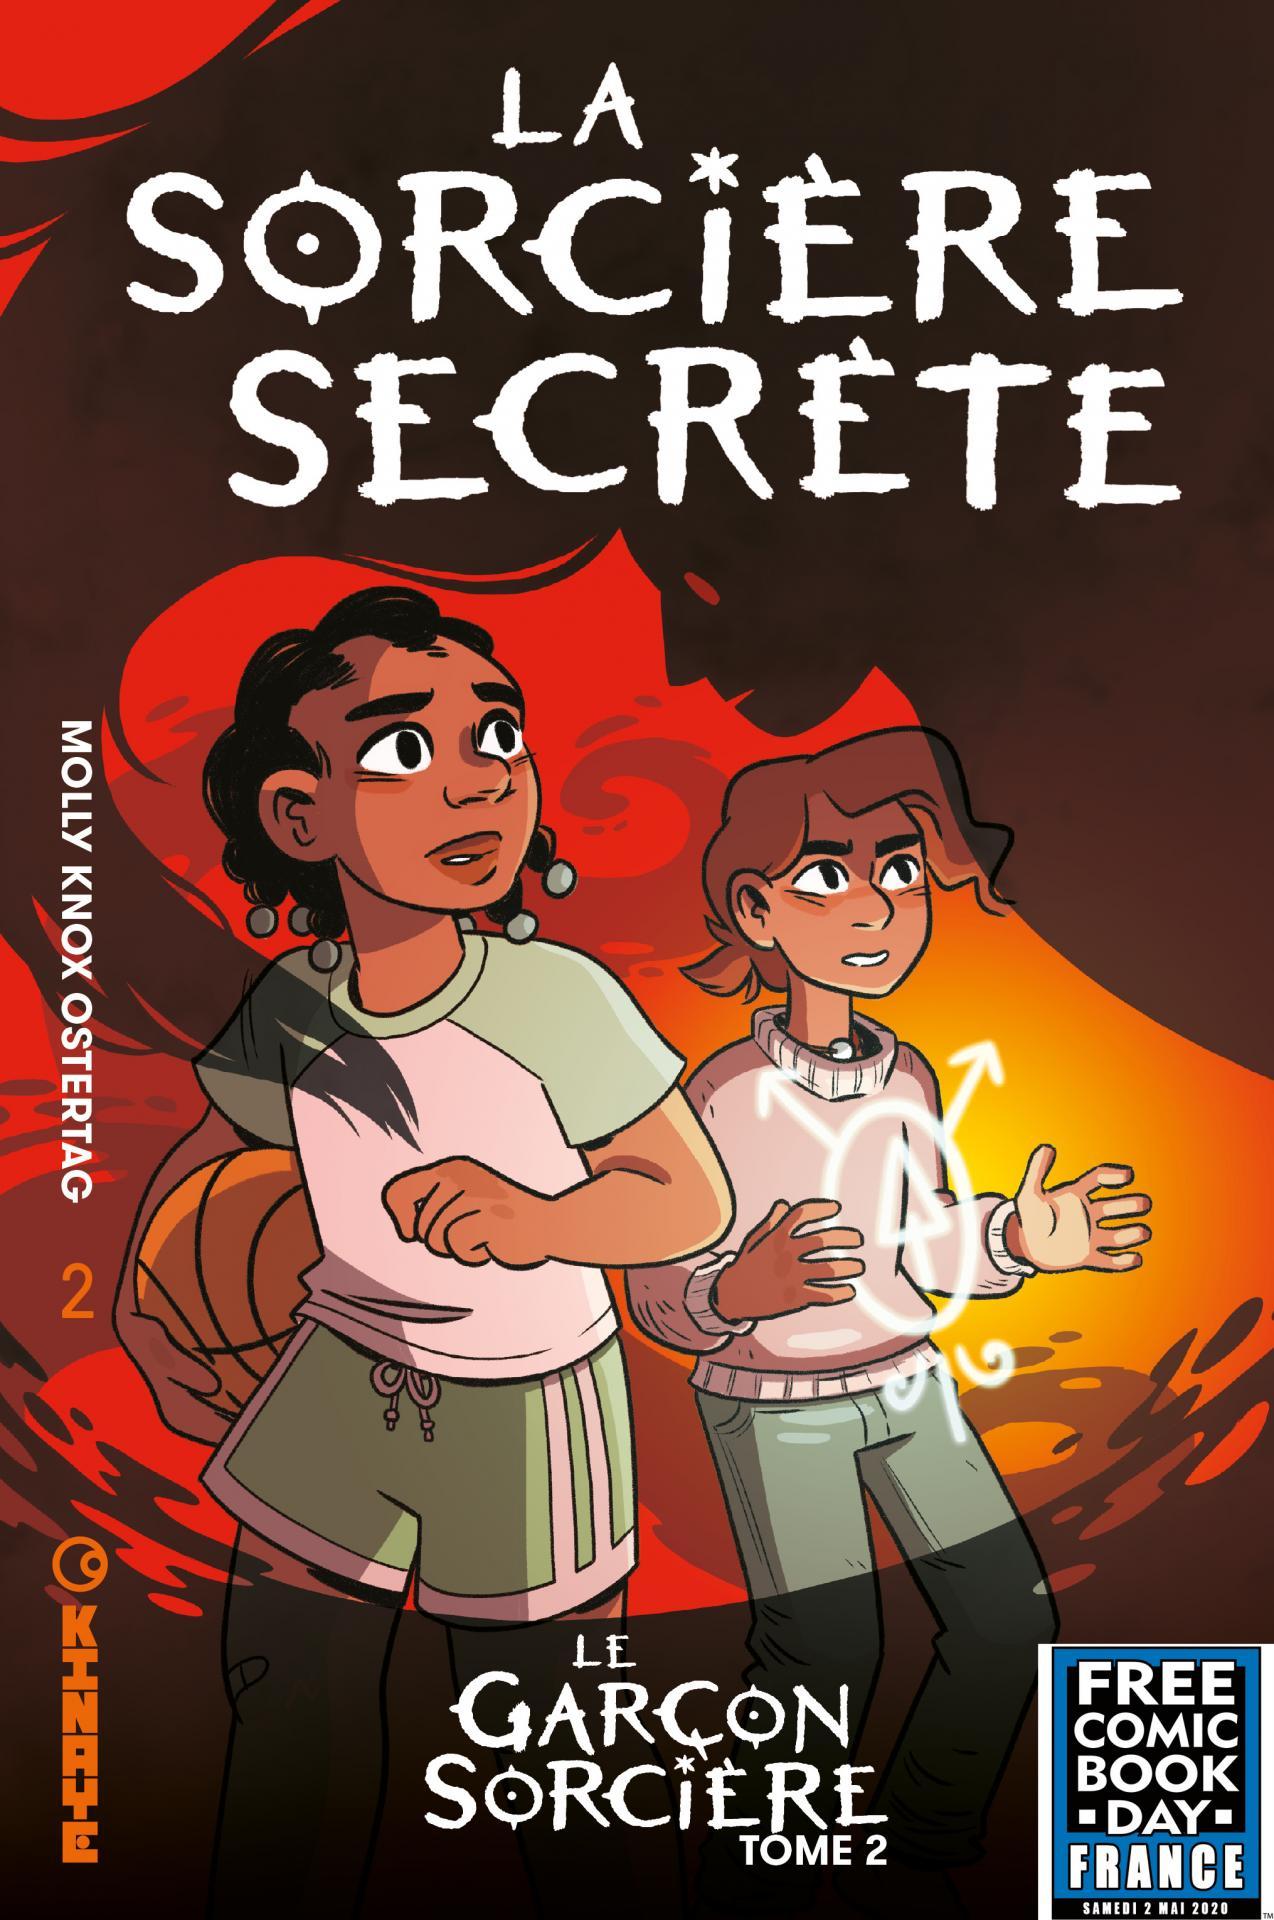 Kinaye comics fcbd france 2020 la sorciere secrete